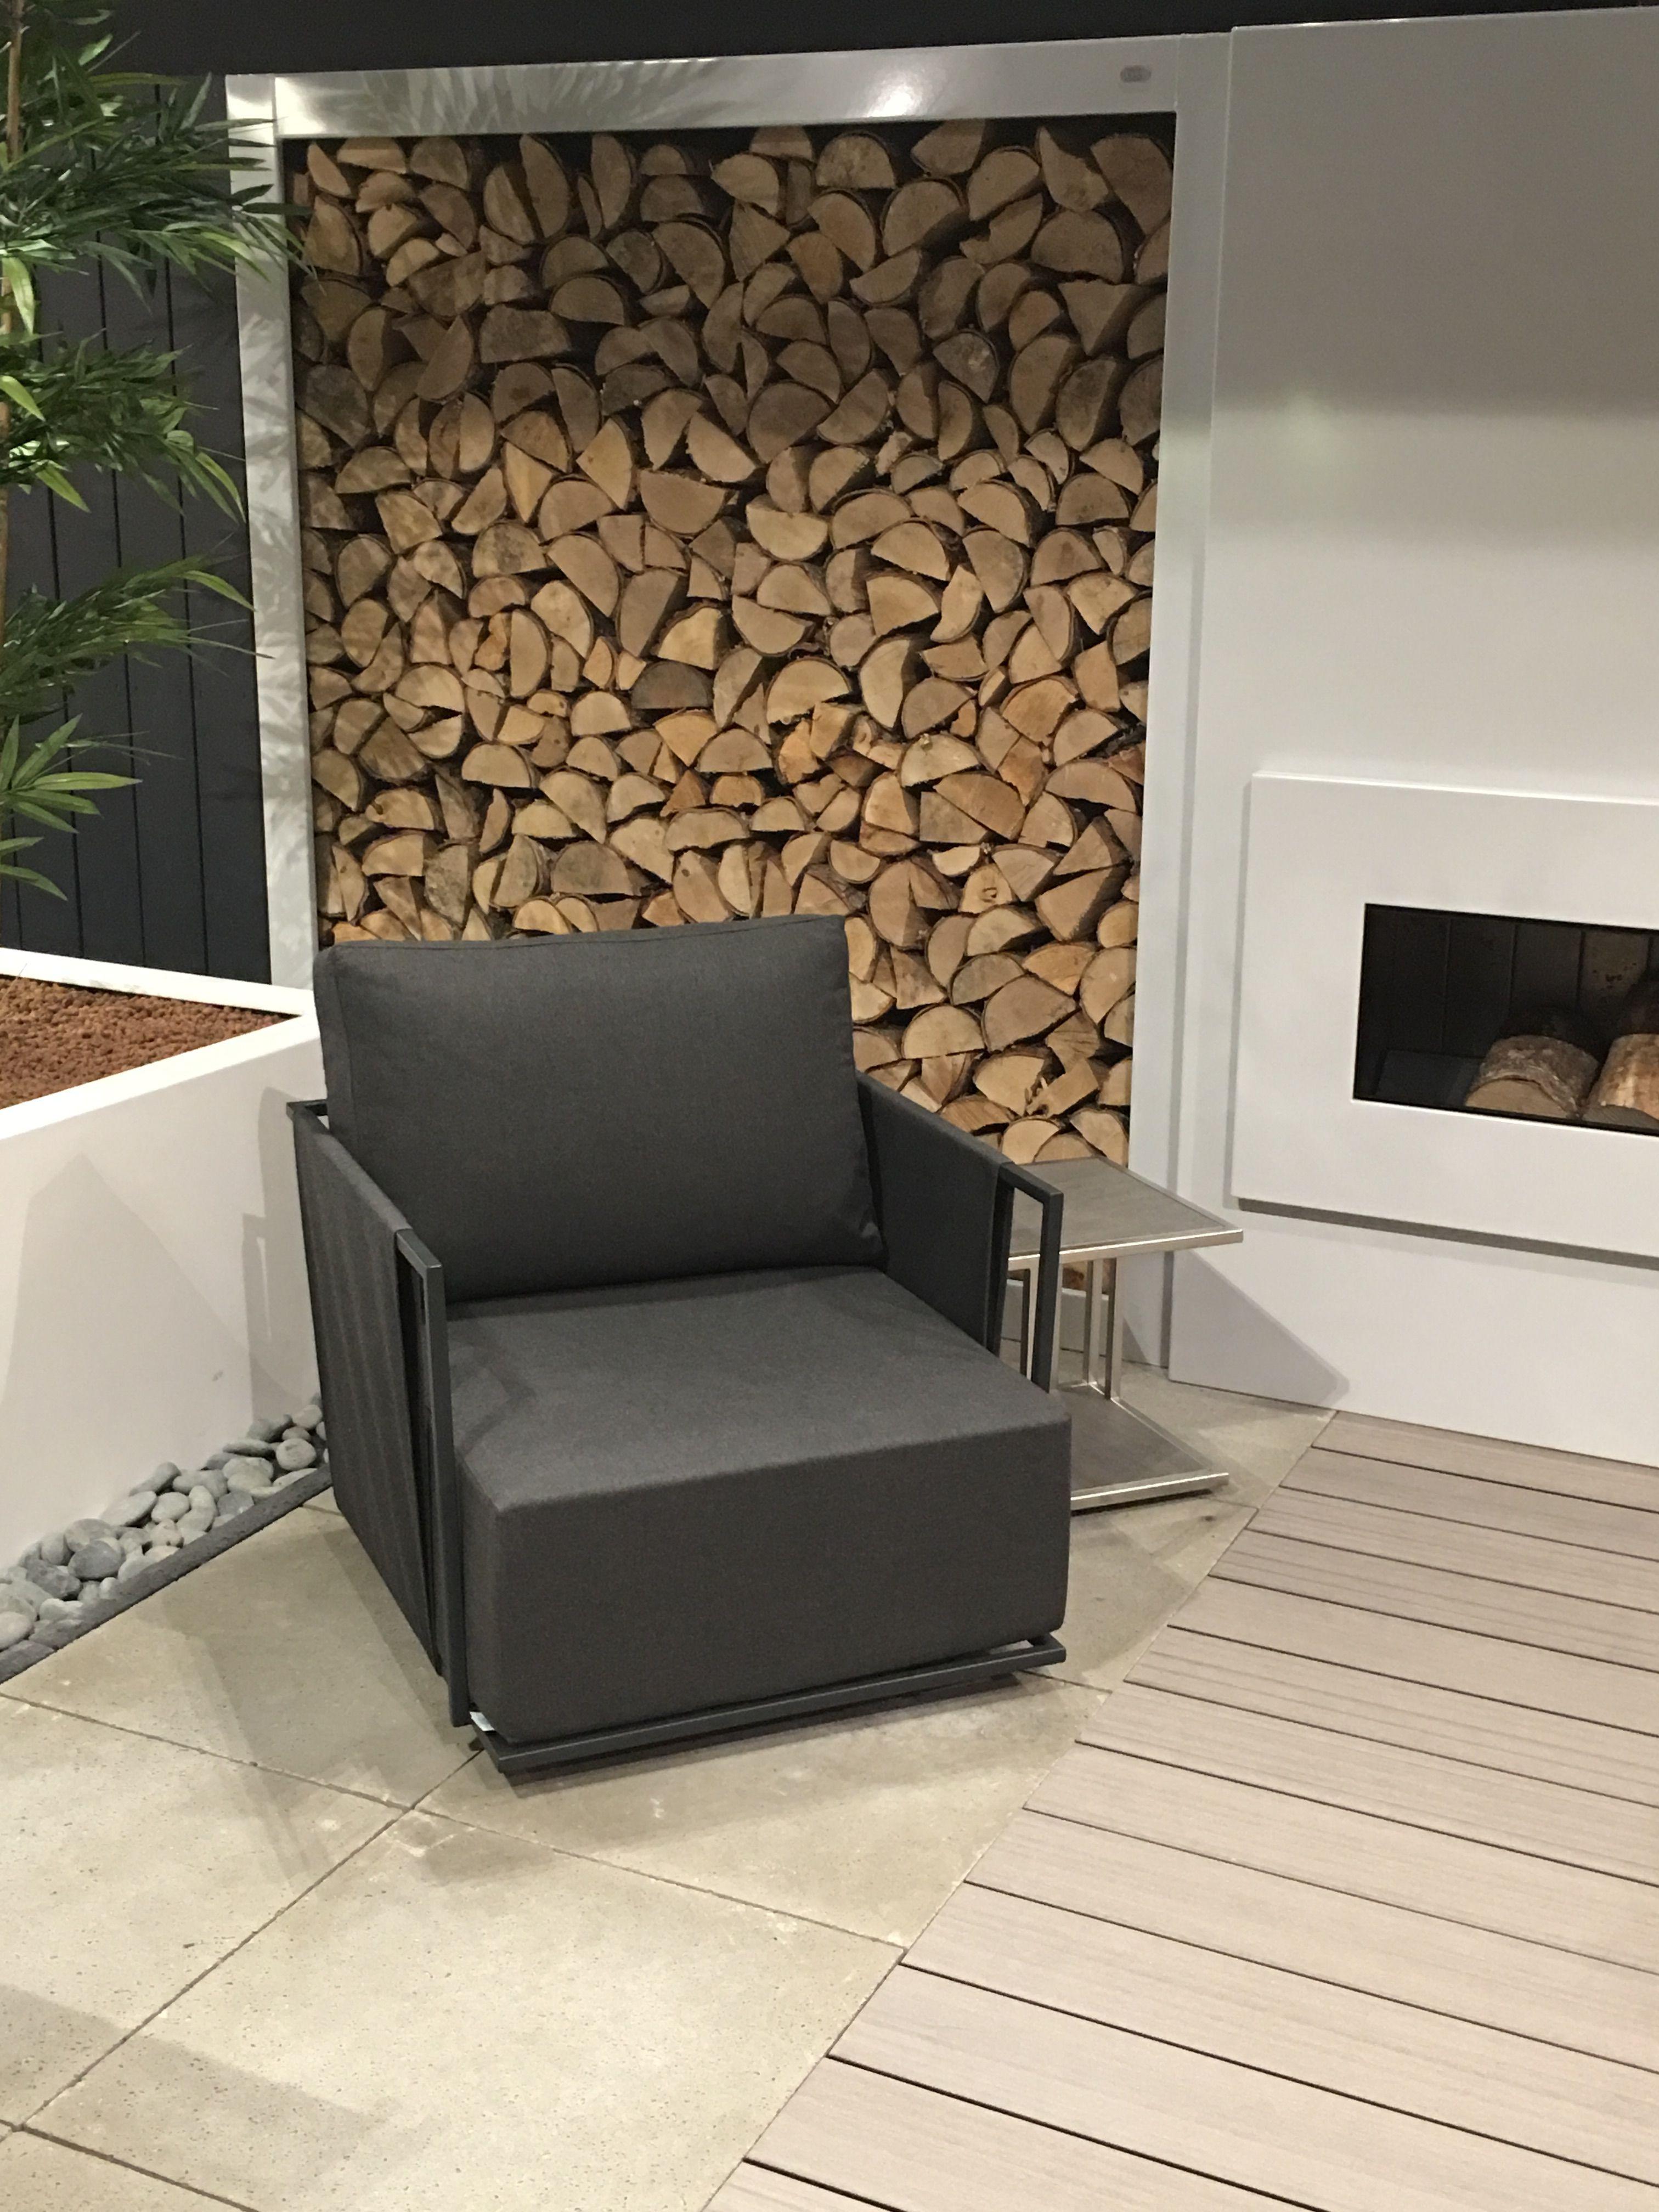 Showroom HaWé Outdoor Fisher Möbel #lounge #chair #buitenhaard ...